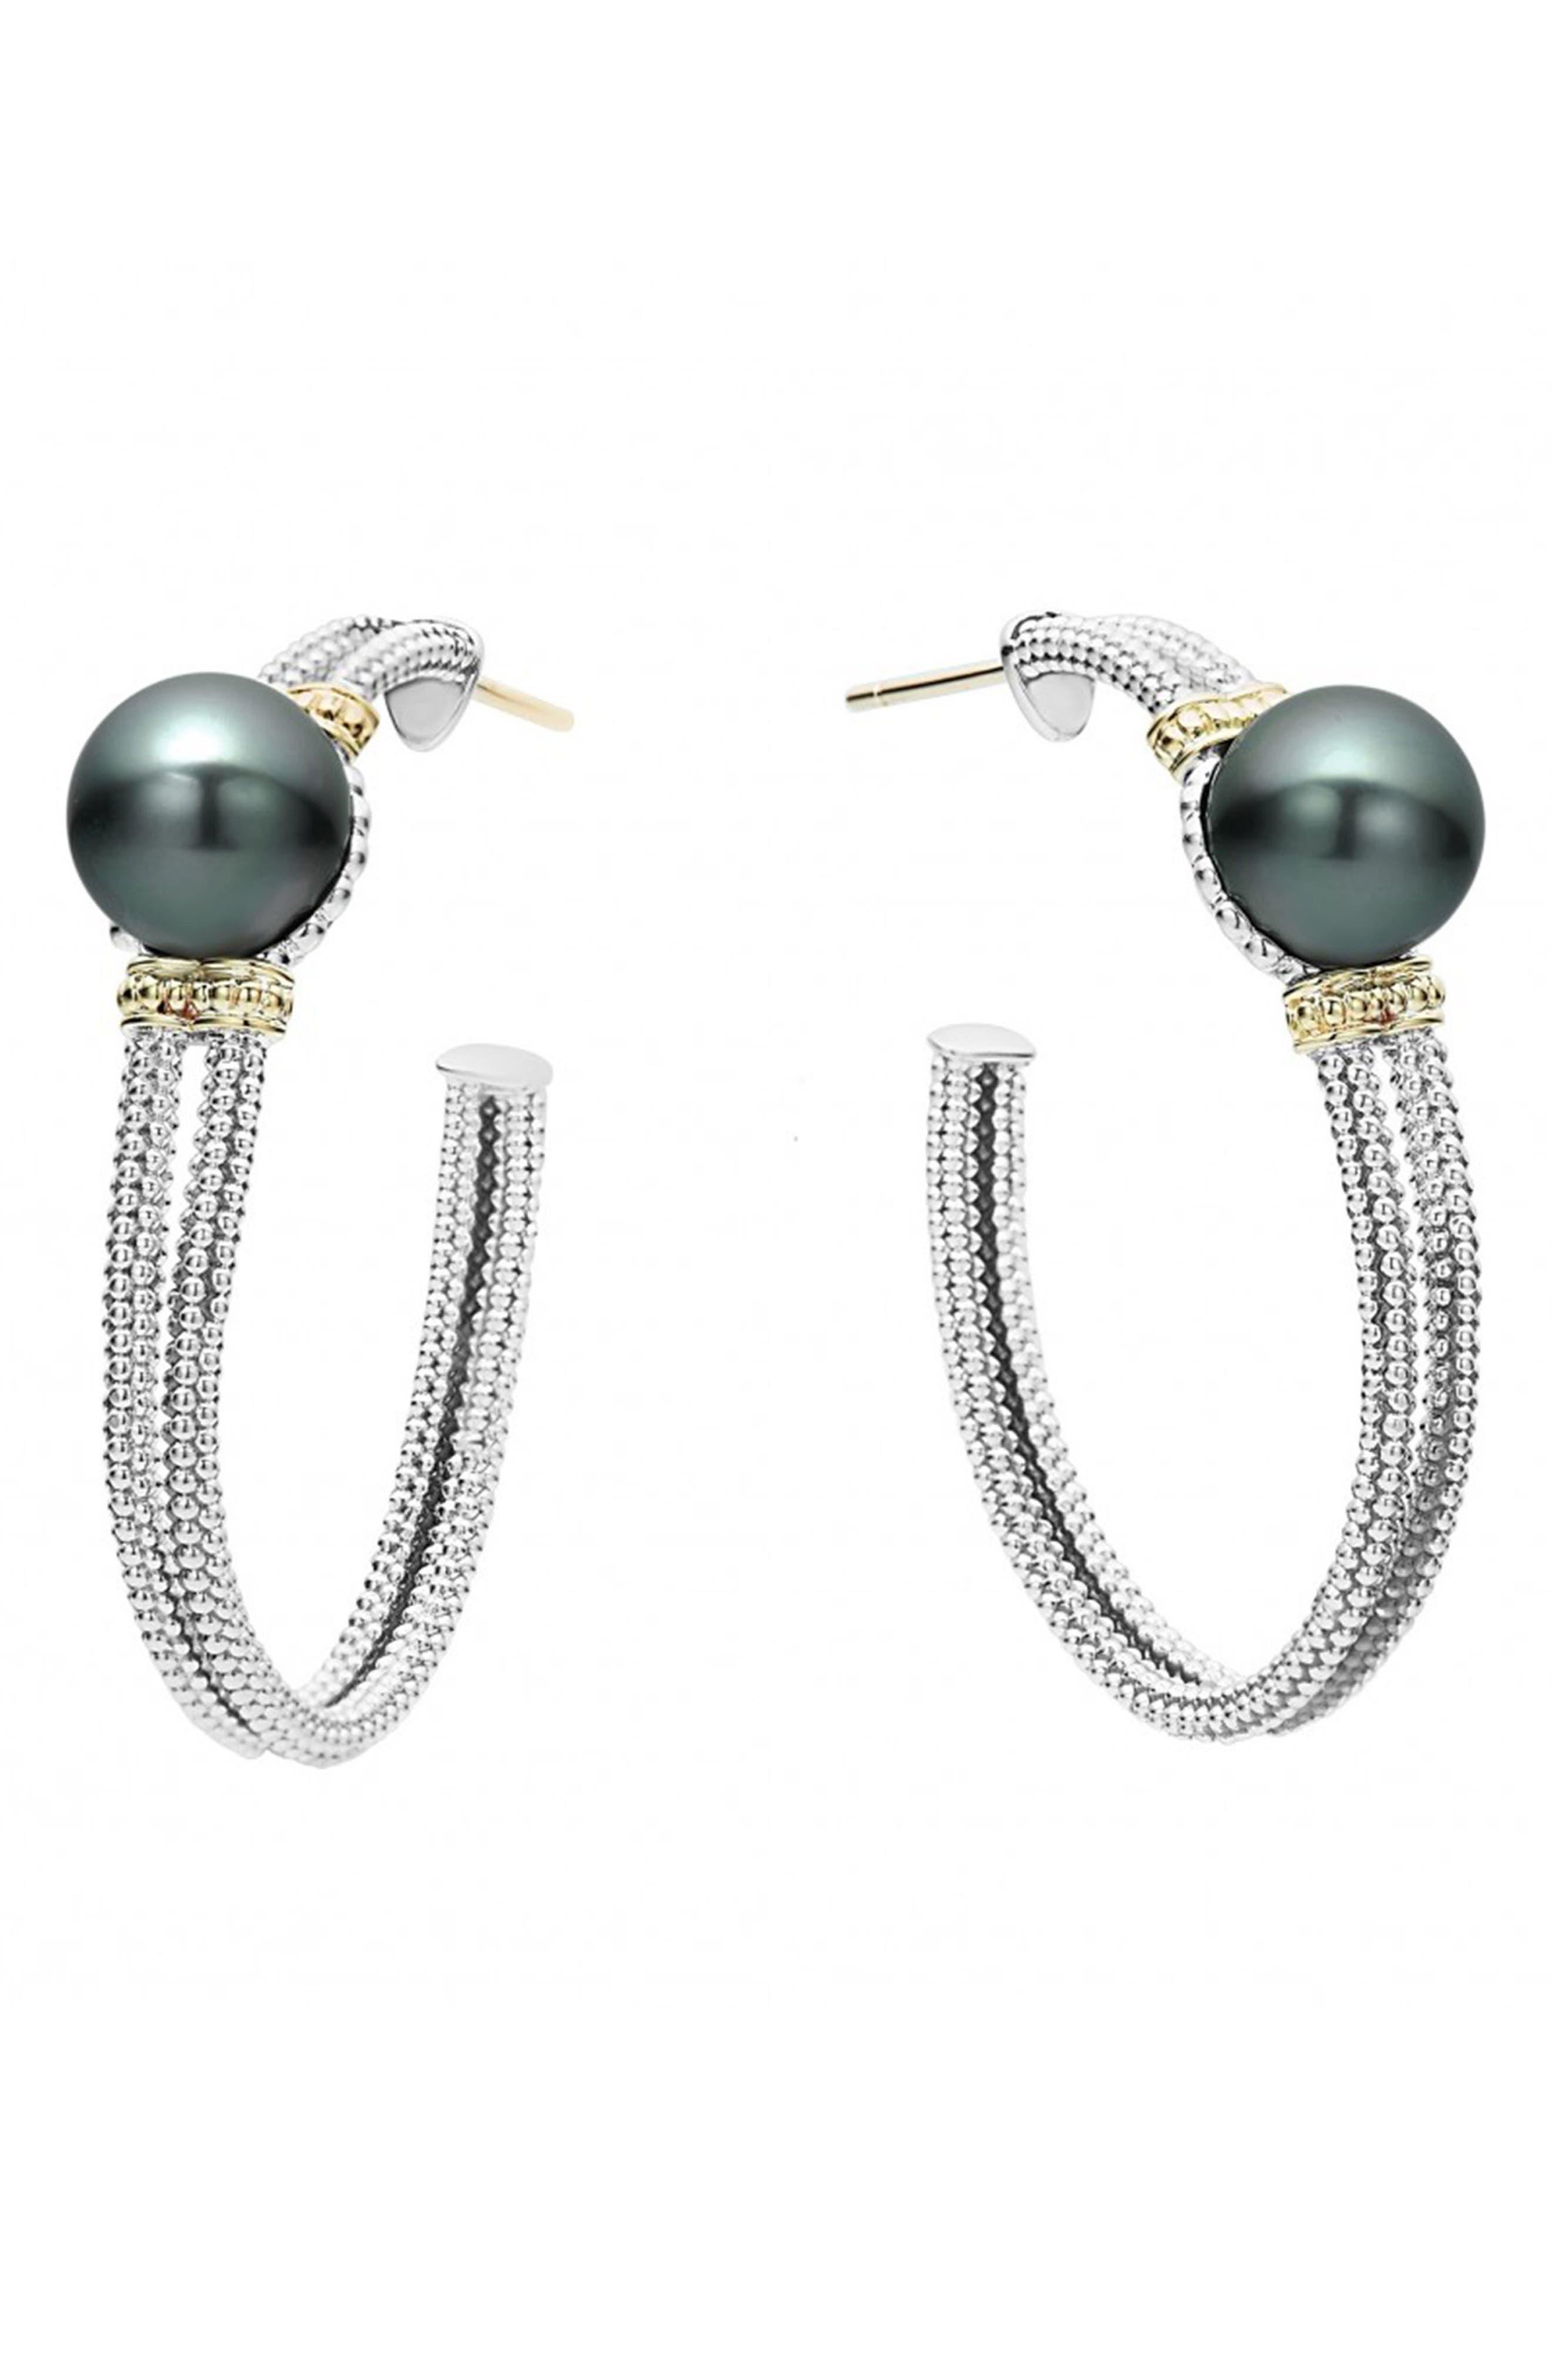 Luna 10mm Pearl Hoop Earrings,                             Main thumbnail 1, color,                             001